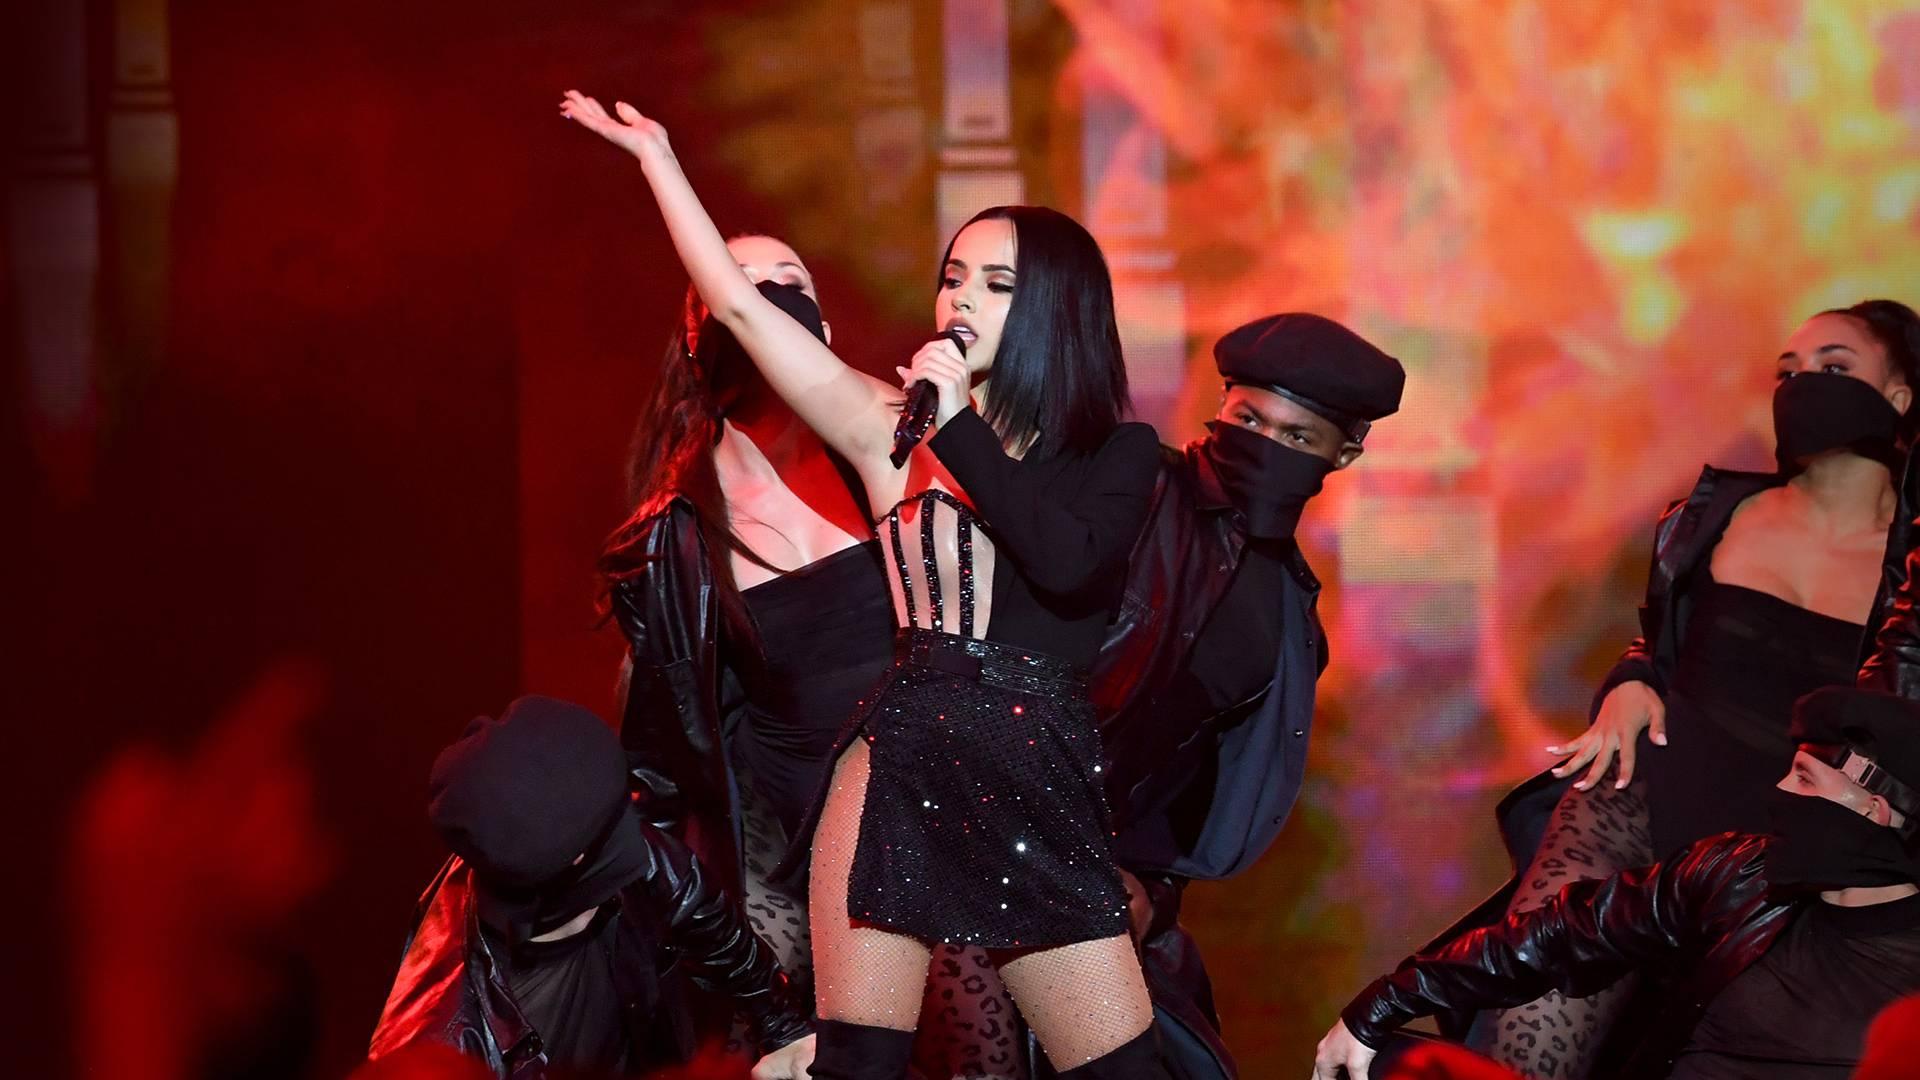 MTV 2019 EMAs   Becky G Performance   16:9   1920x1080   11/03/19